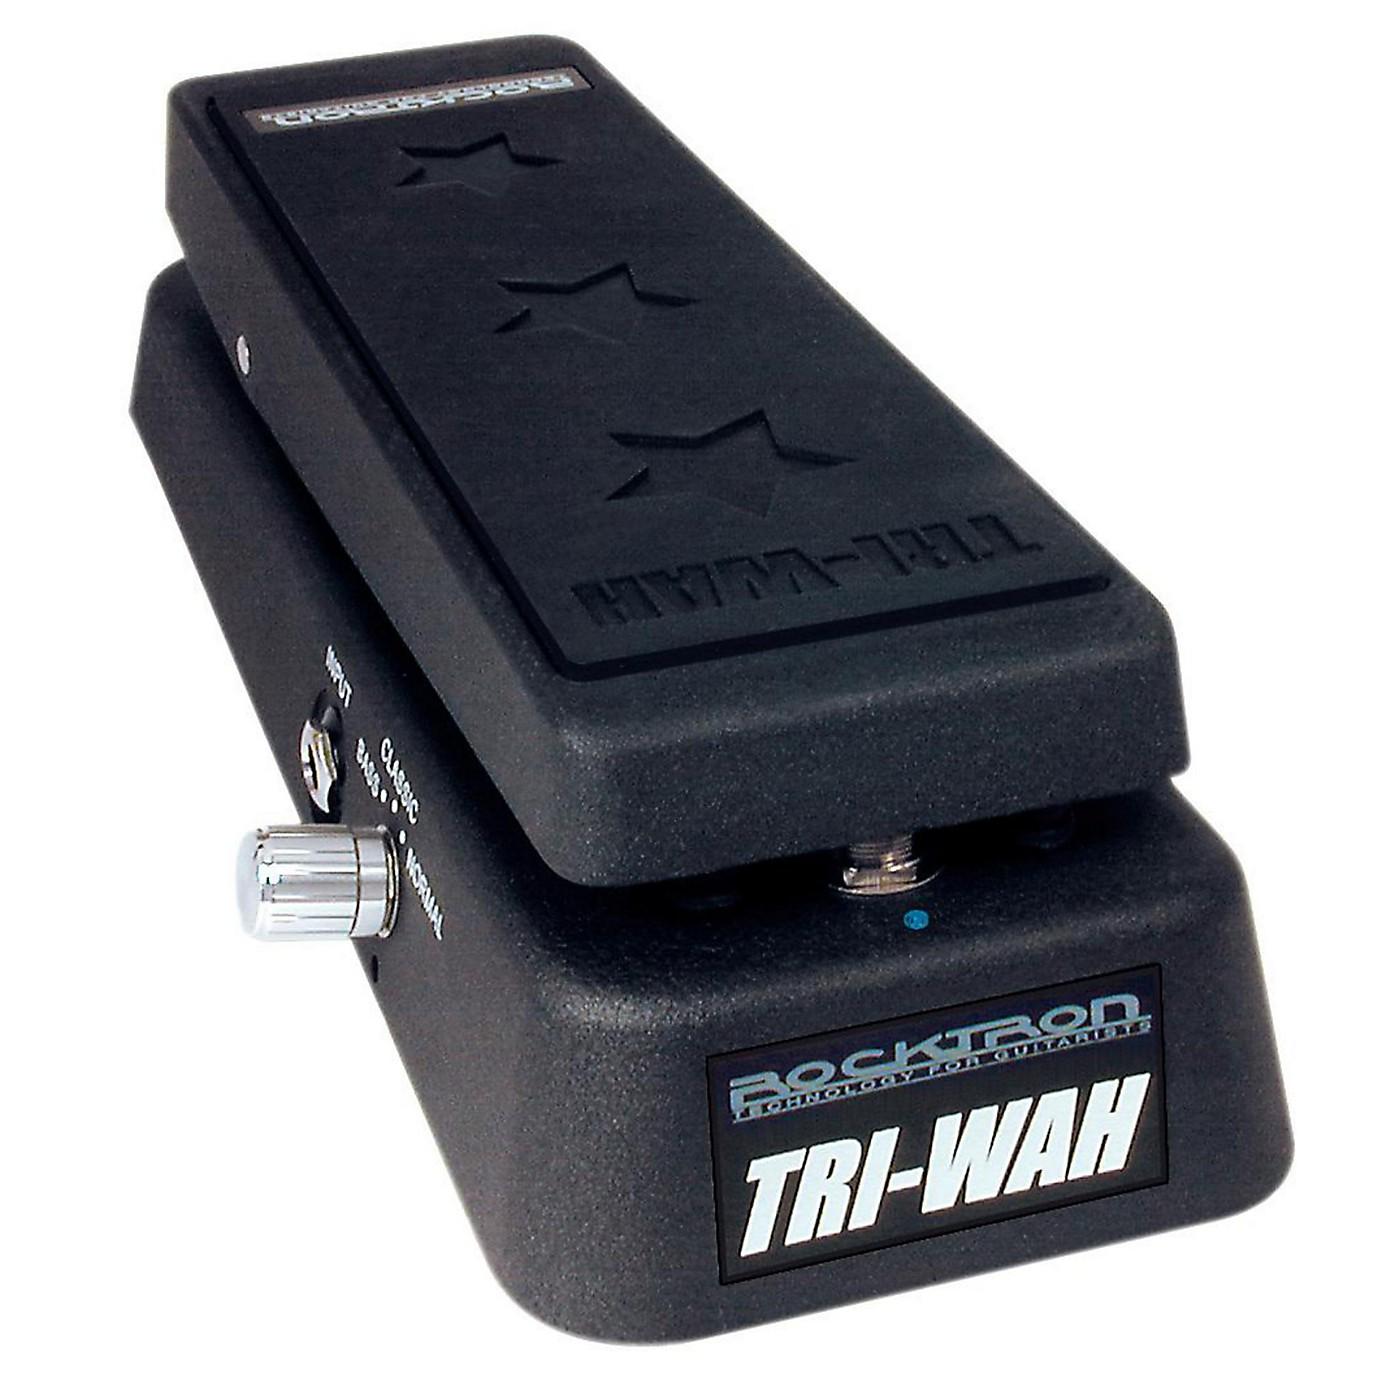 Rocktron Tri Wah Selectable Mode Wah Pedal thumbnail